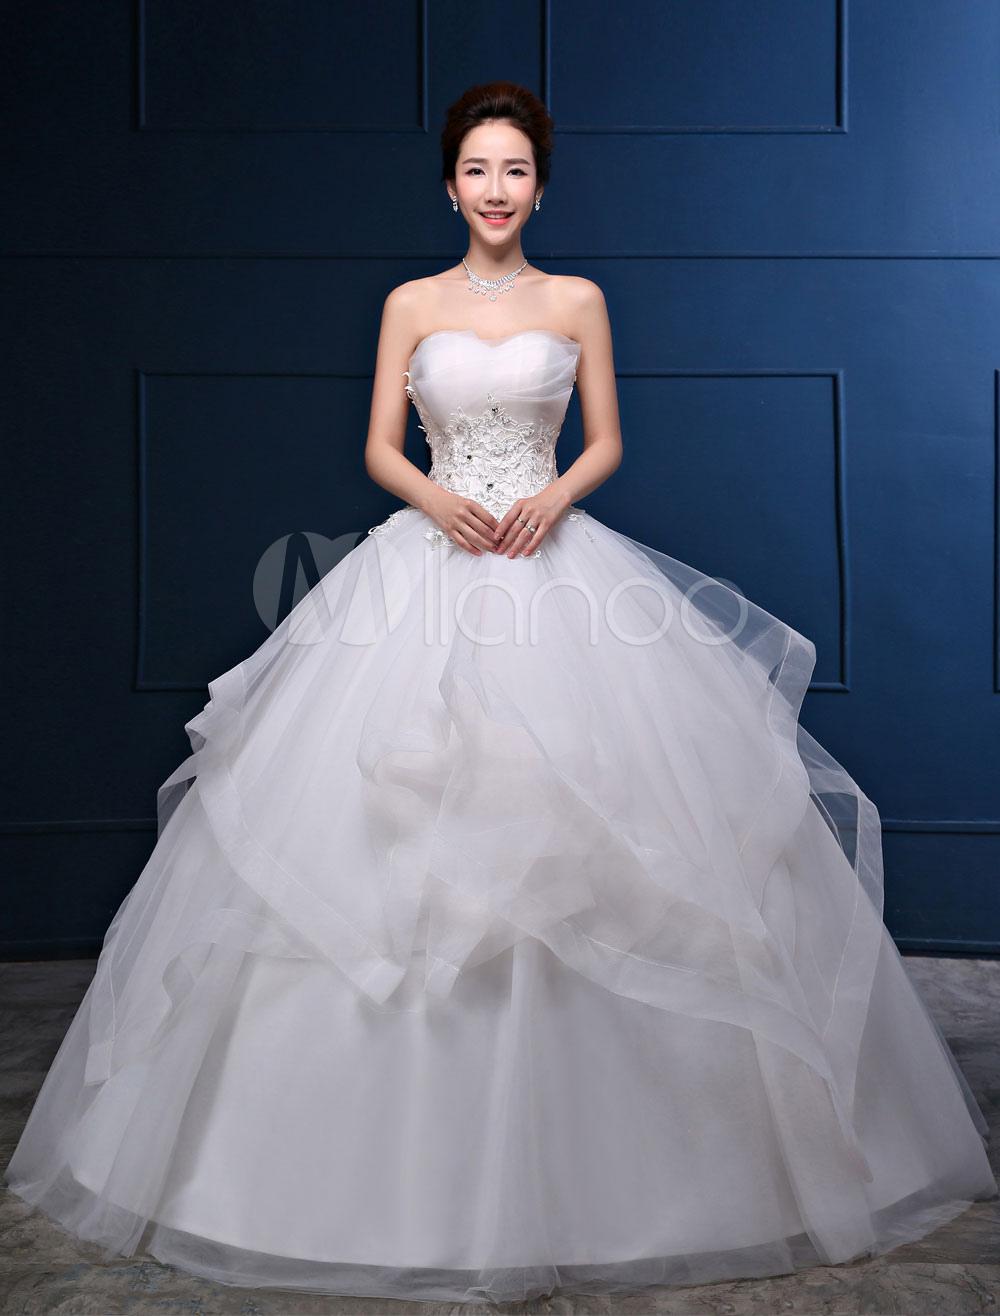 Strapless Wedding Dress Ivory Princess Ball Gowns Lace Applique Rhinestones Beaded Ruffles Floor Length Bridal Dresses